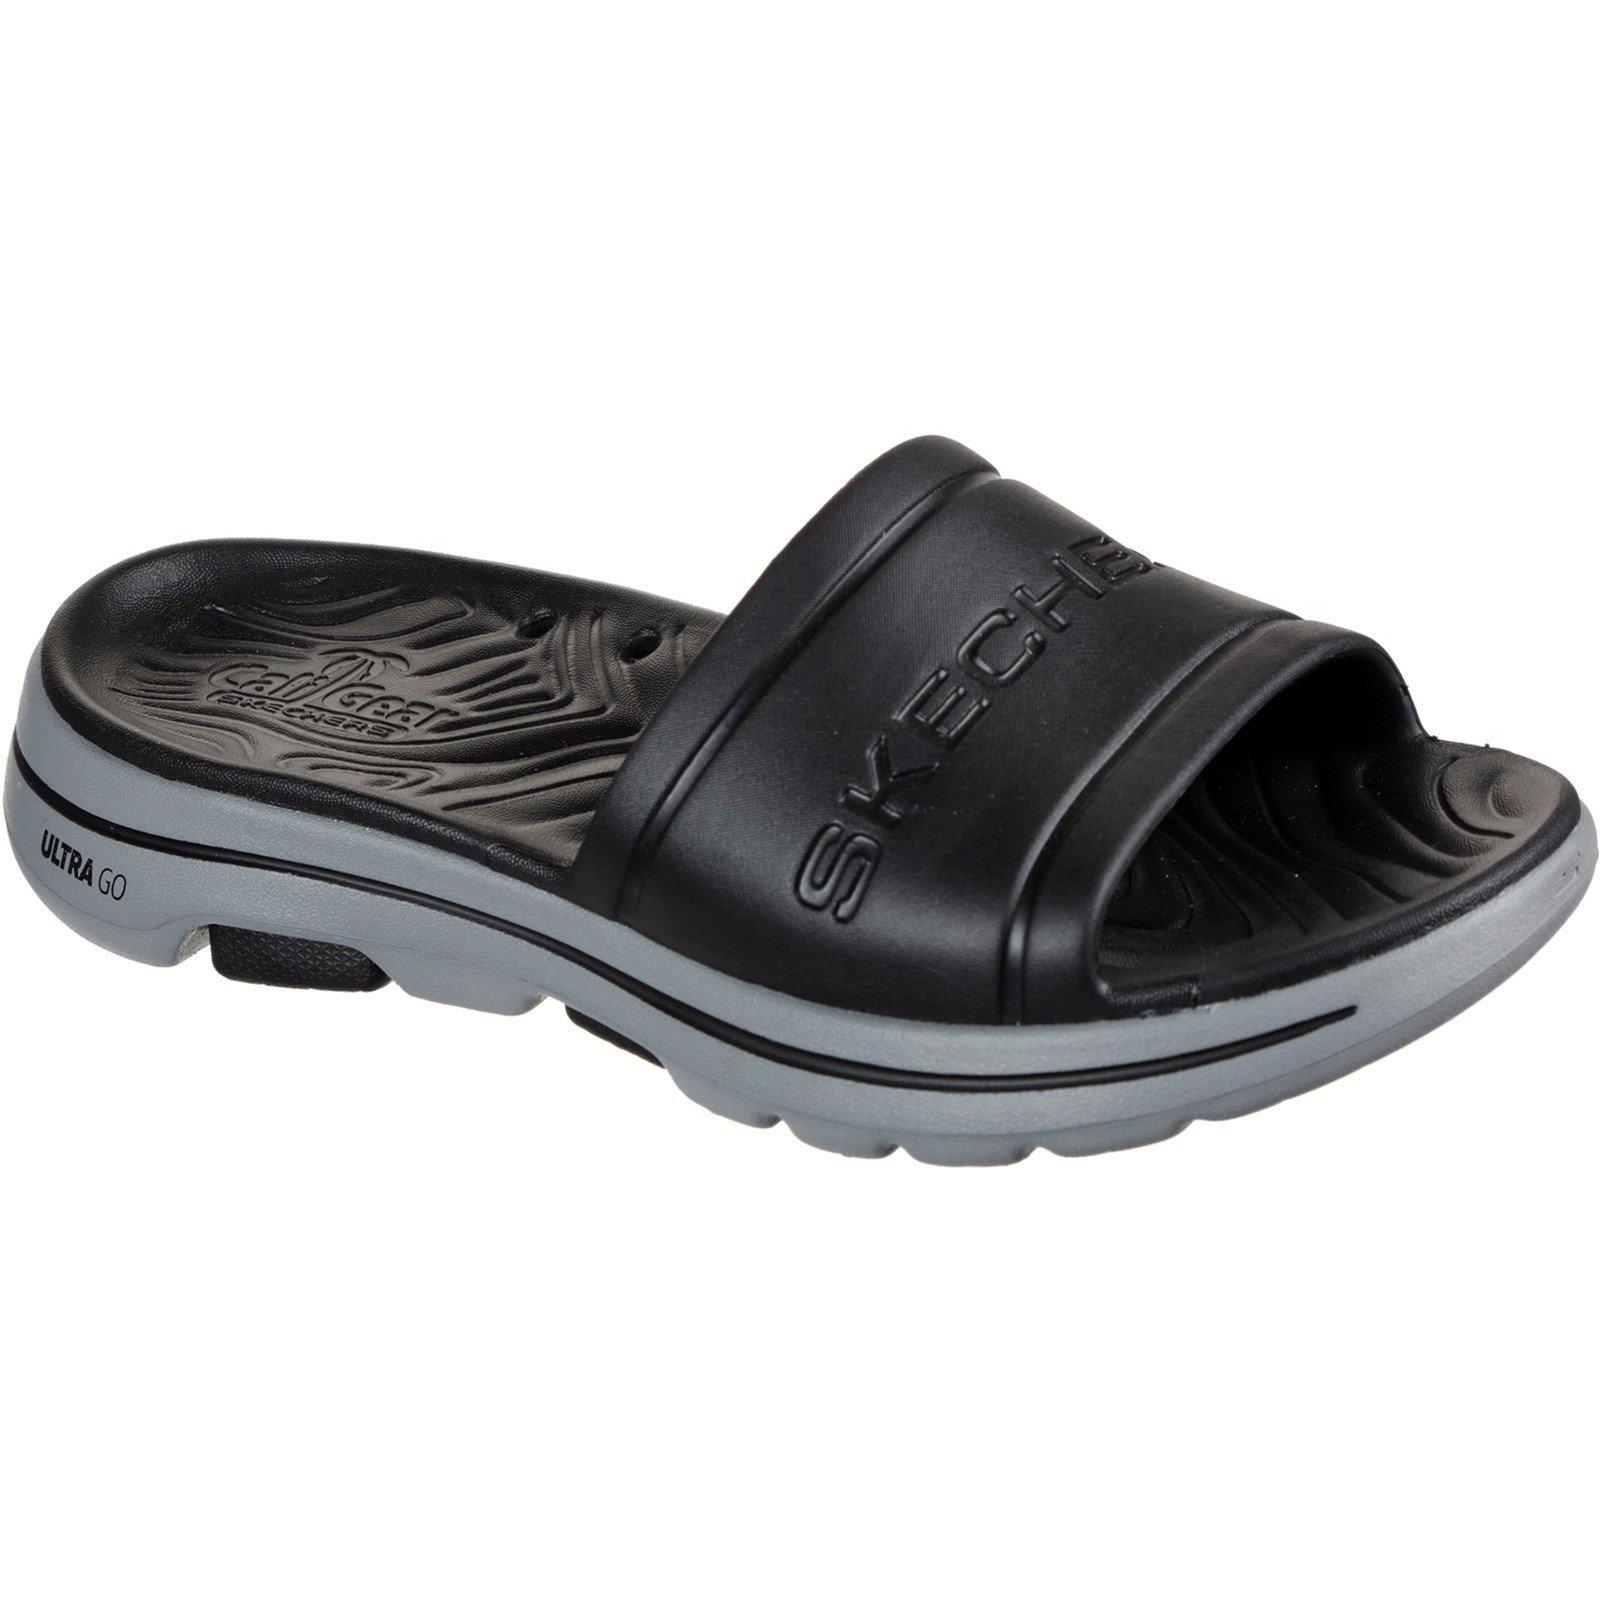 Skechers Men's Go Walk 5 Surfs Out Summer Sandal Various Colours 32207 - Black/Grey 6